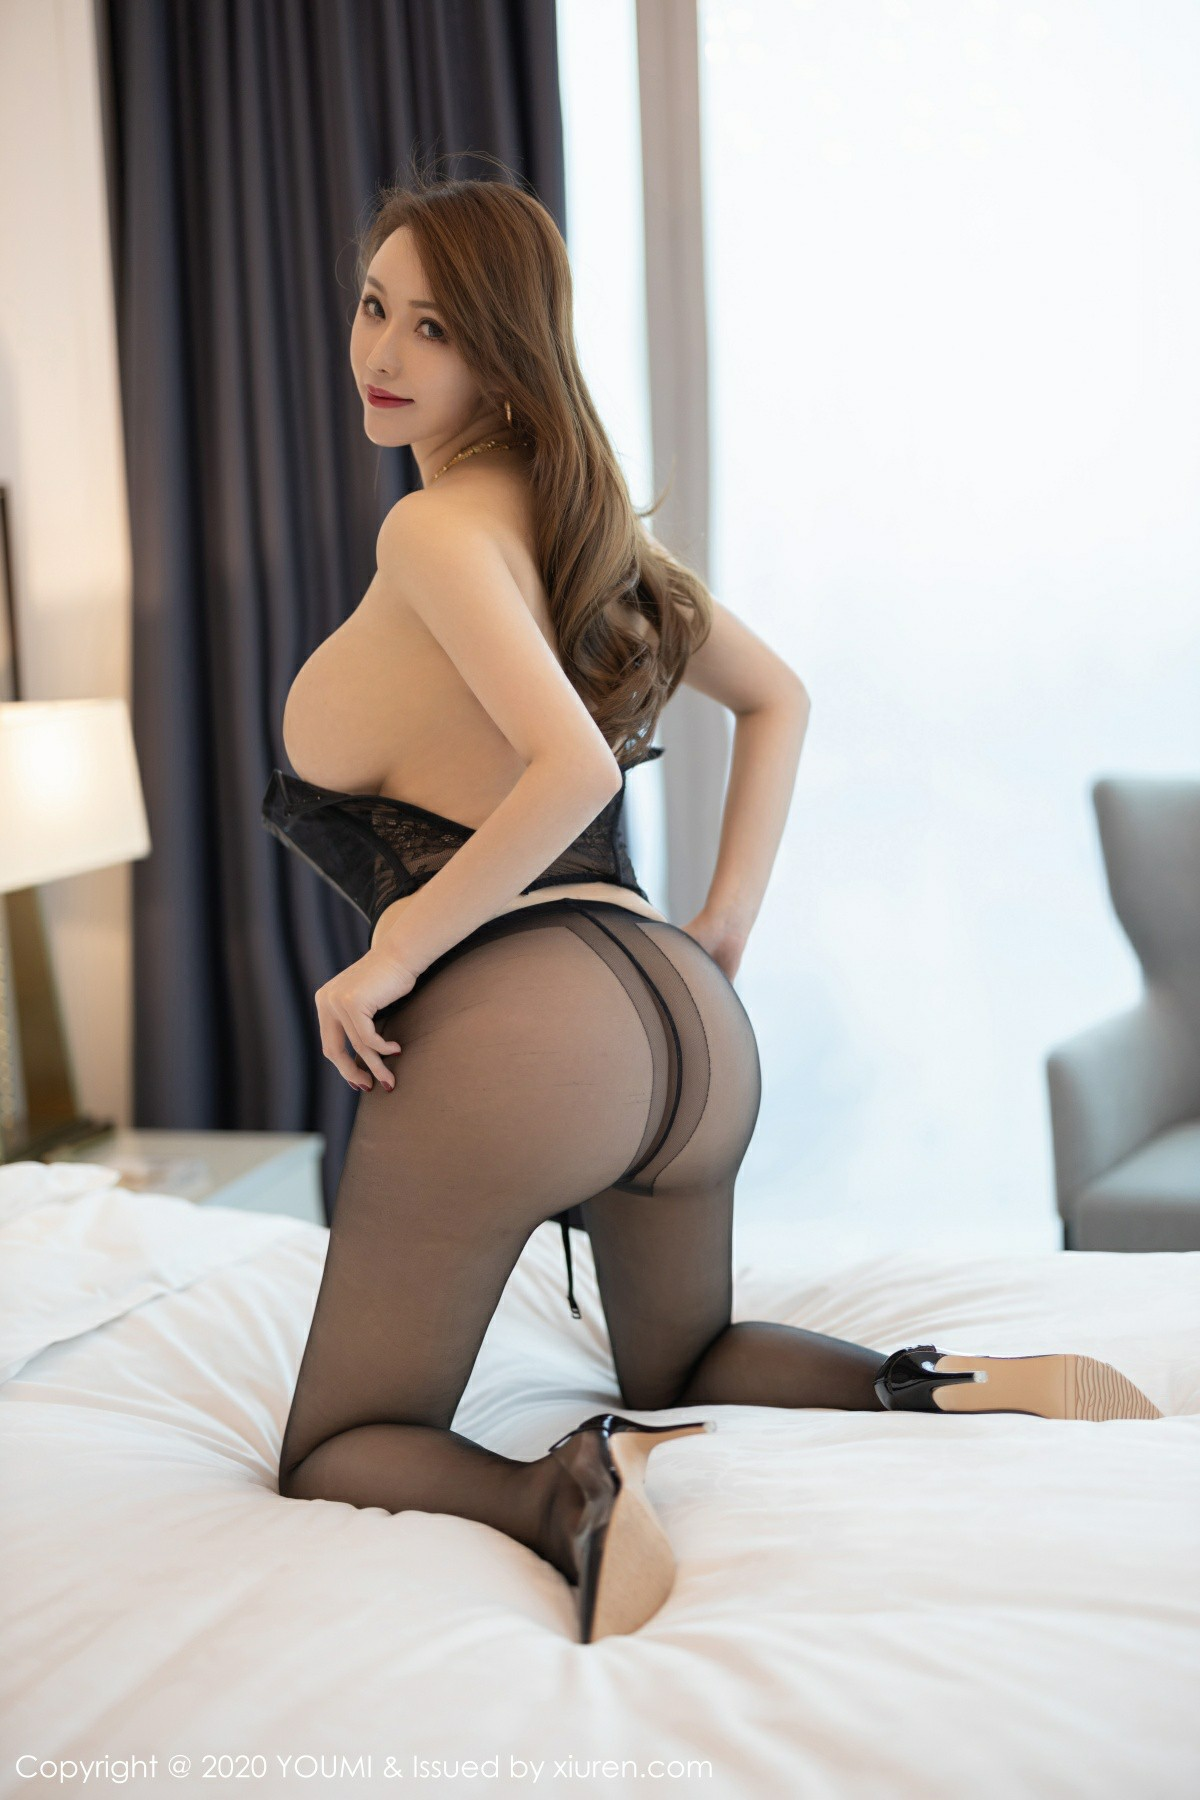 [YOUMI尤蜜荟]2020.04.03 VOL.447 Egg 尤妮丝Egg[56P] 尤蜜荟 第2张